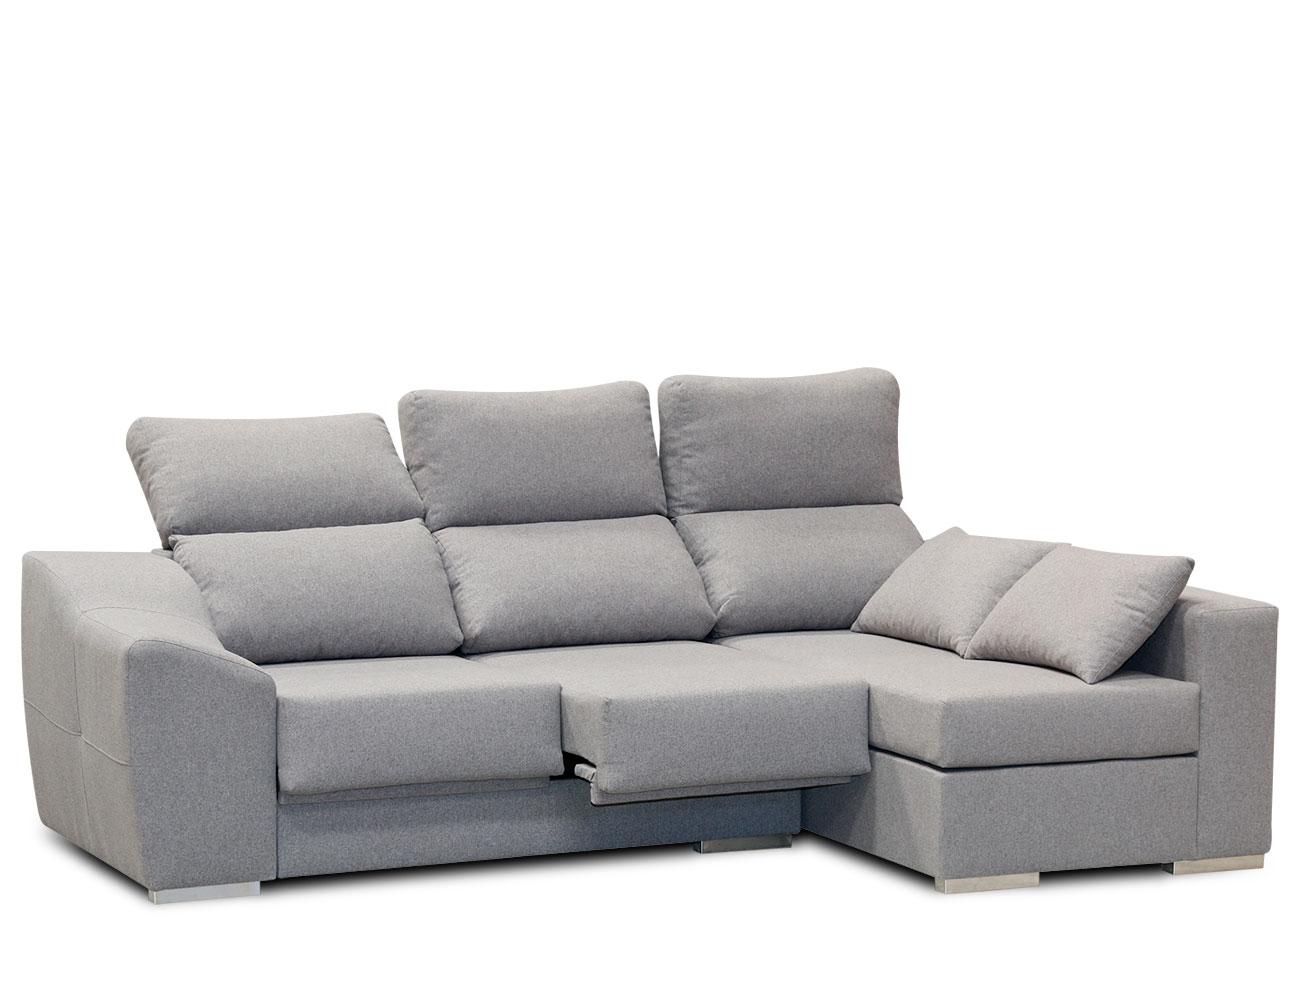 Sofa chaiselongue moderno gris 31